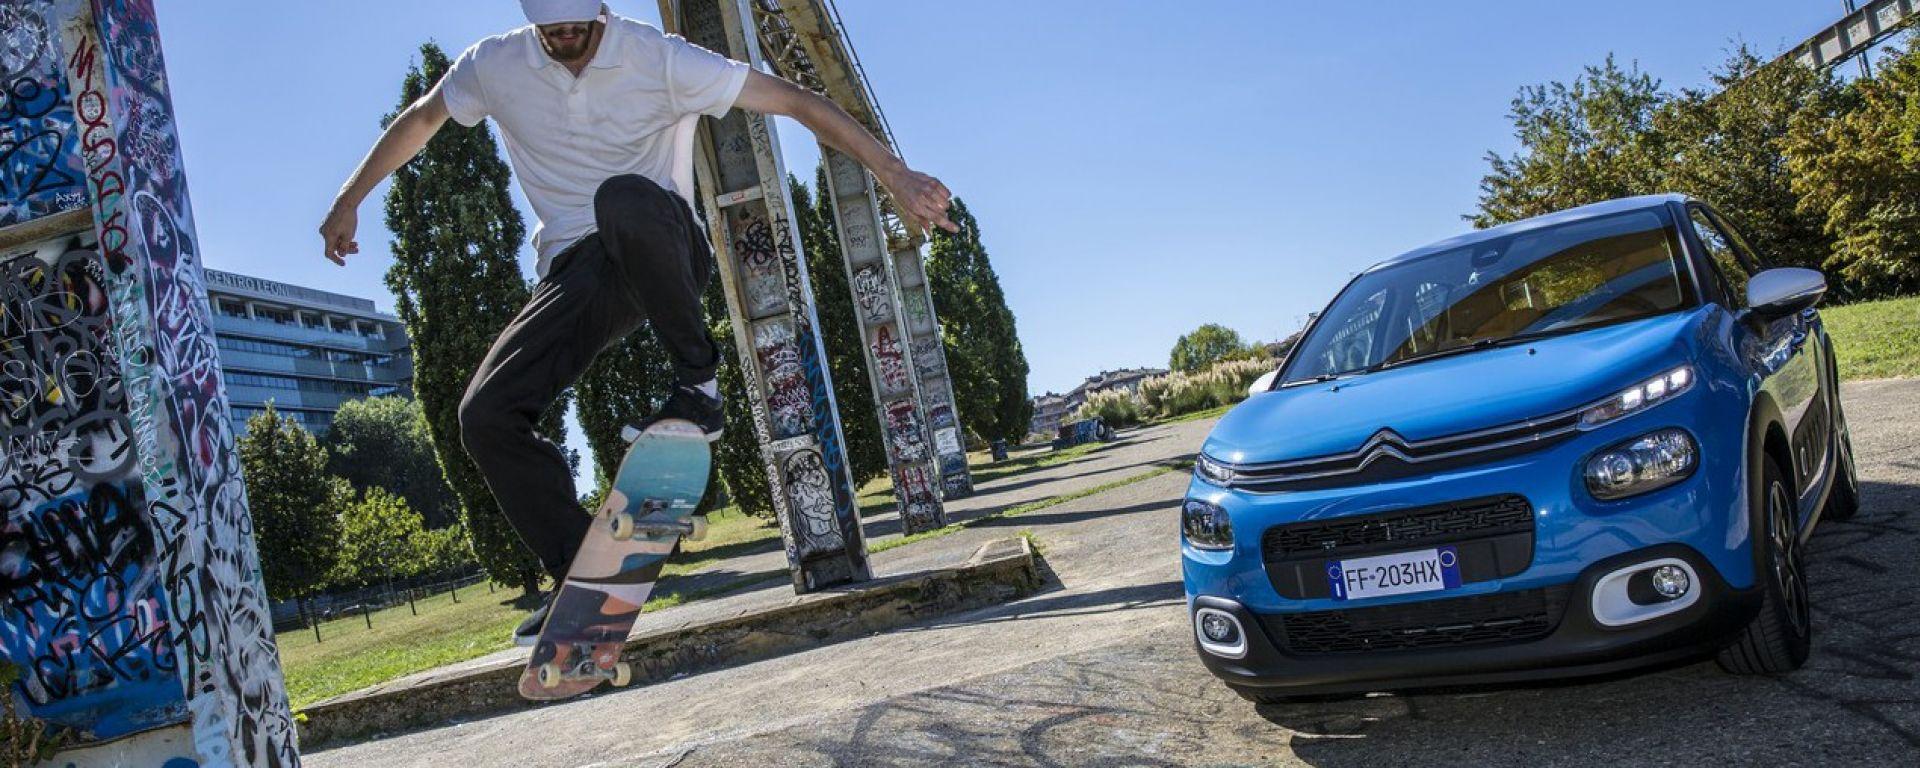 Citroën C3 Facebook-Only, 129 esemplari in pre-ordine